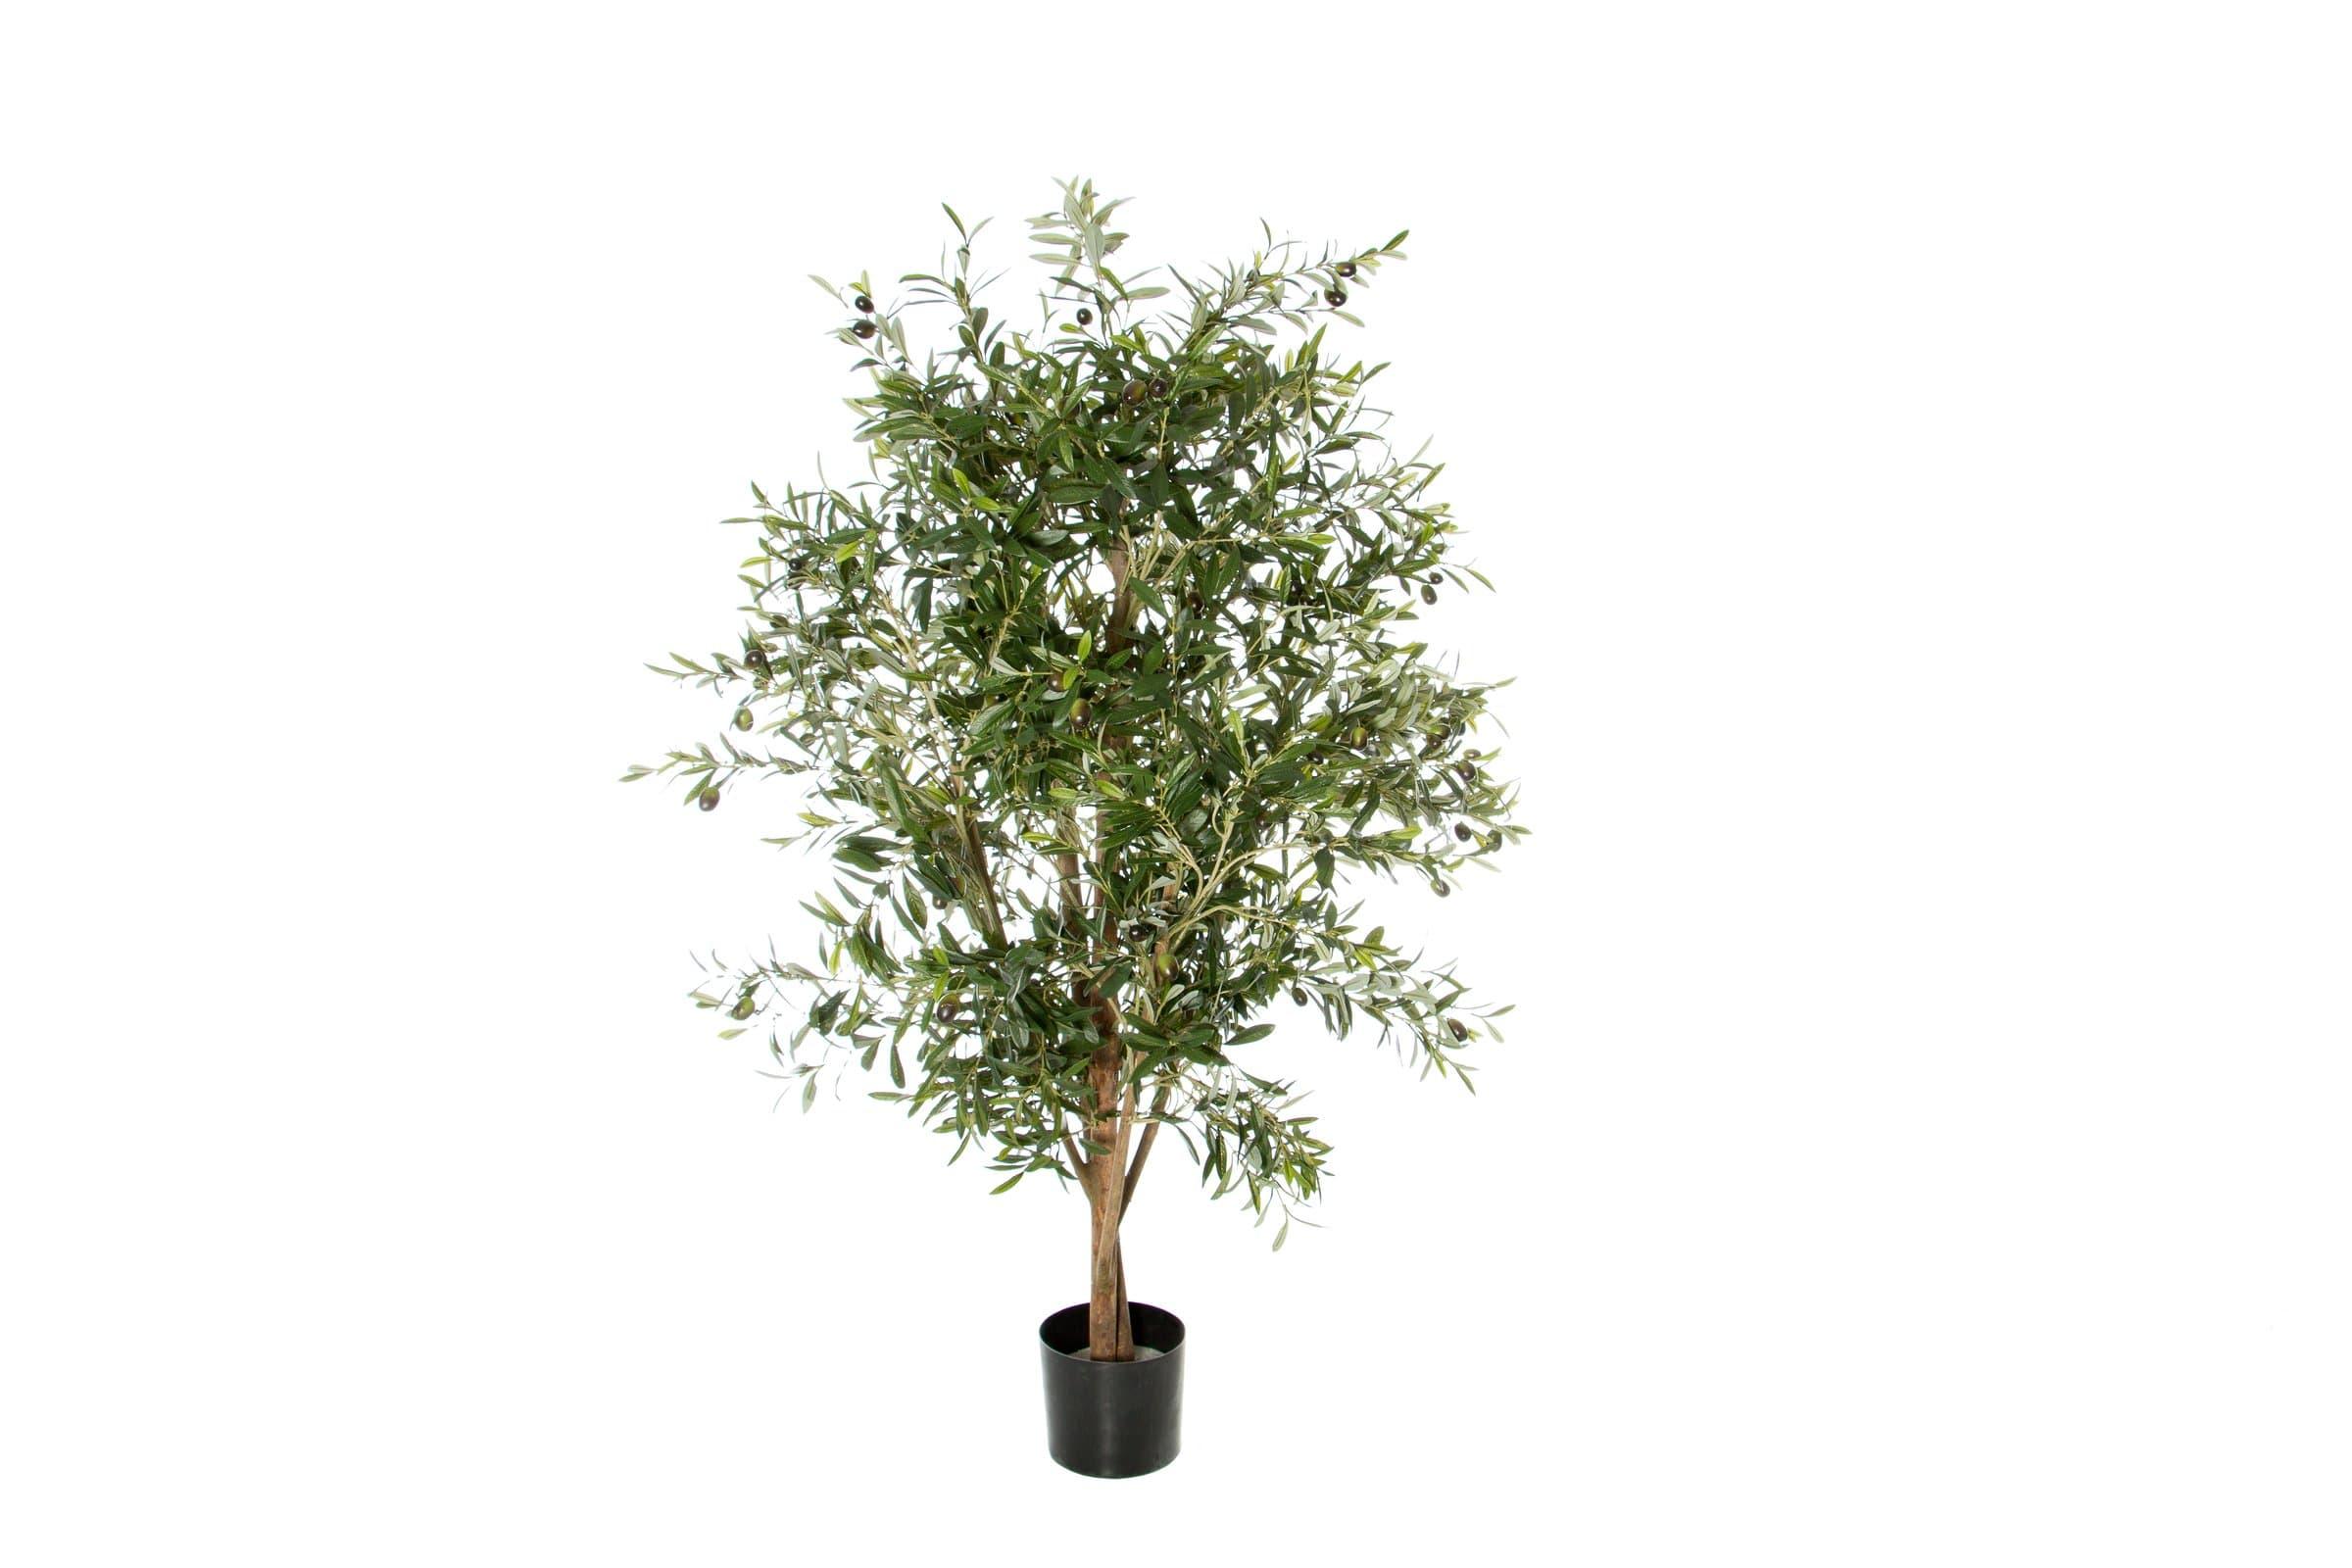 olivenbaum mit fr chten migros. Black Bedroom Furniture Sets. Home Design Ideas